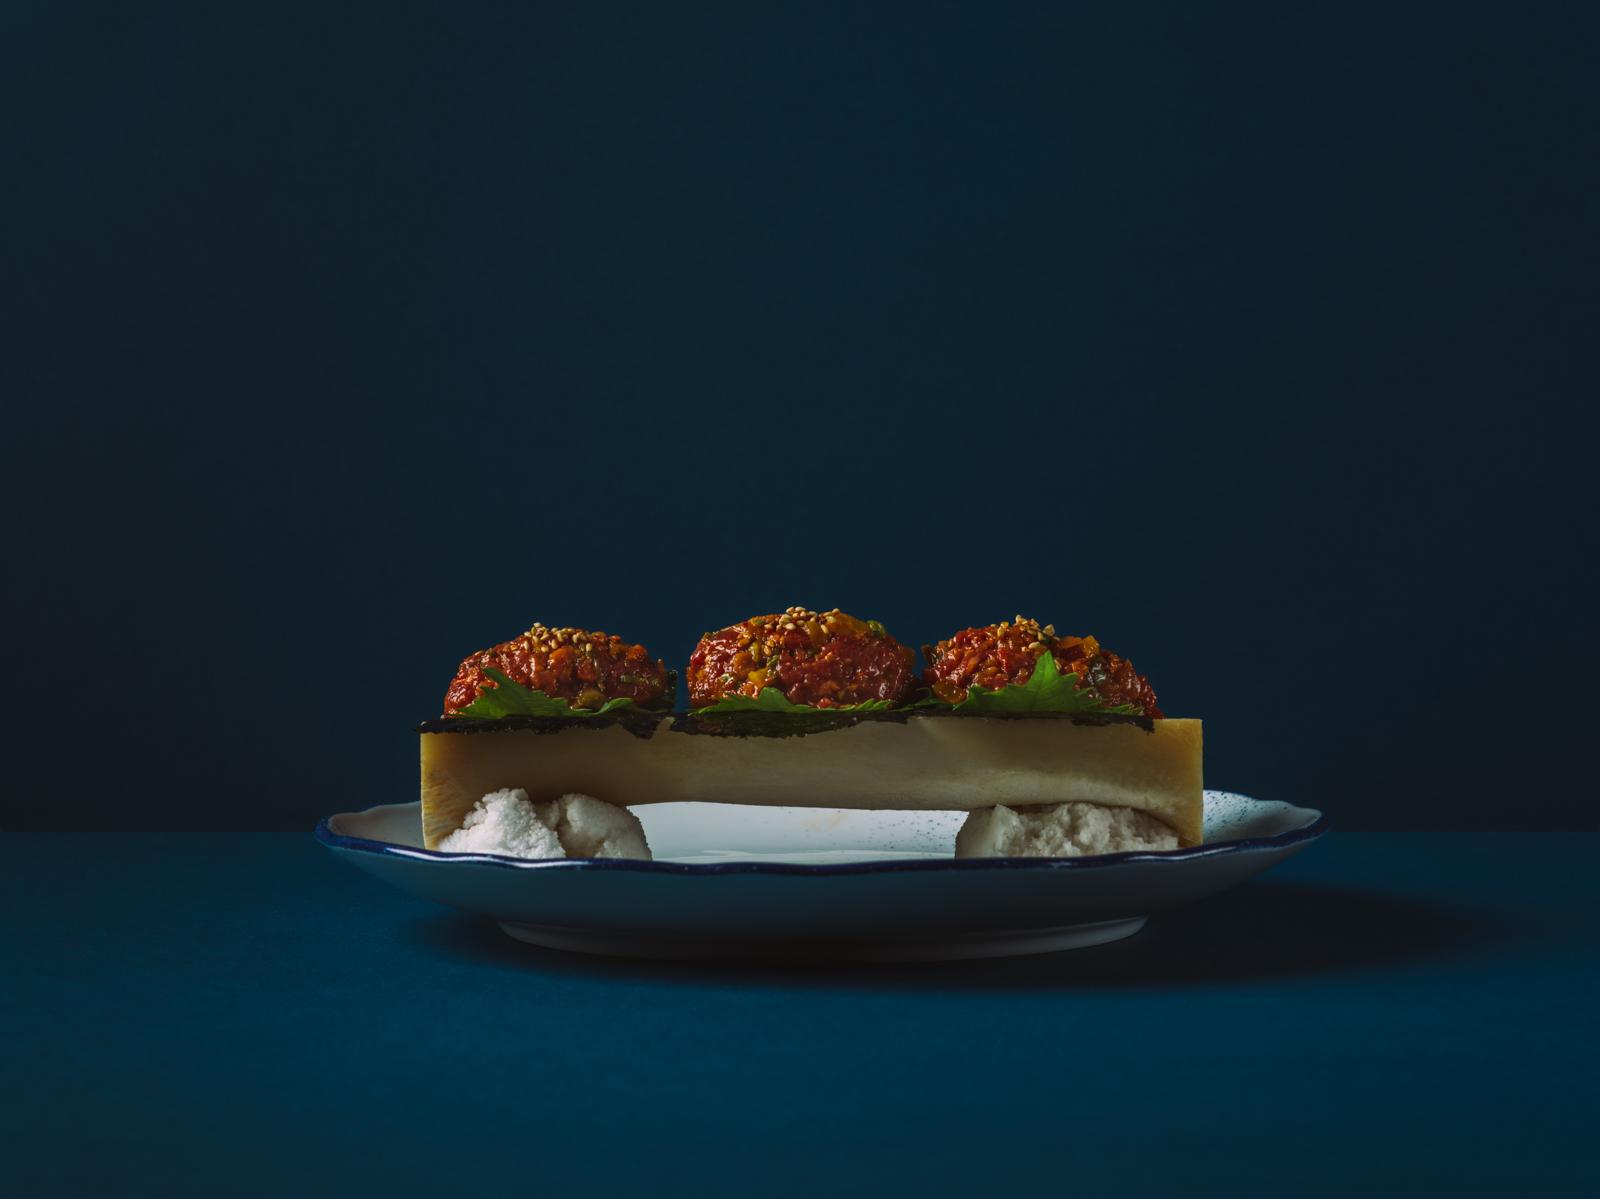 Rice-and-Gold-Food-All-Good-NYC-Nick-Johnson-Photography-5.JPG